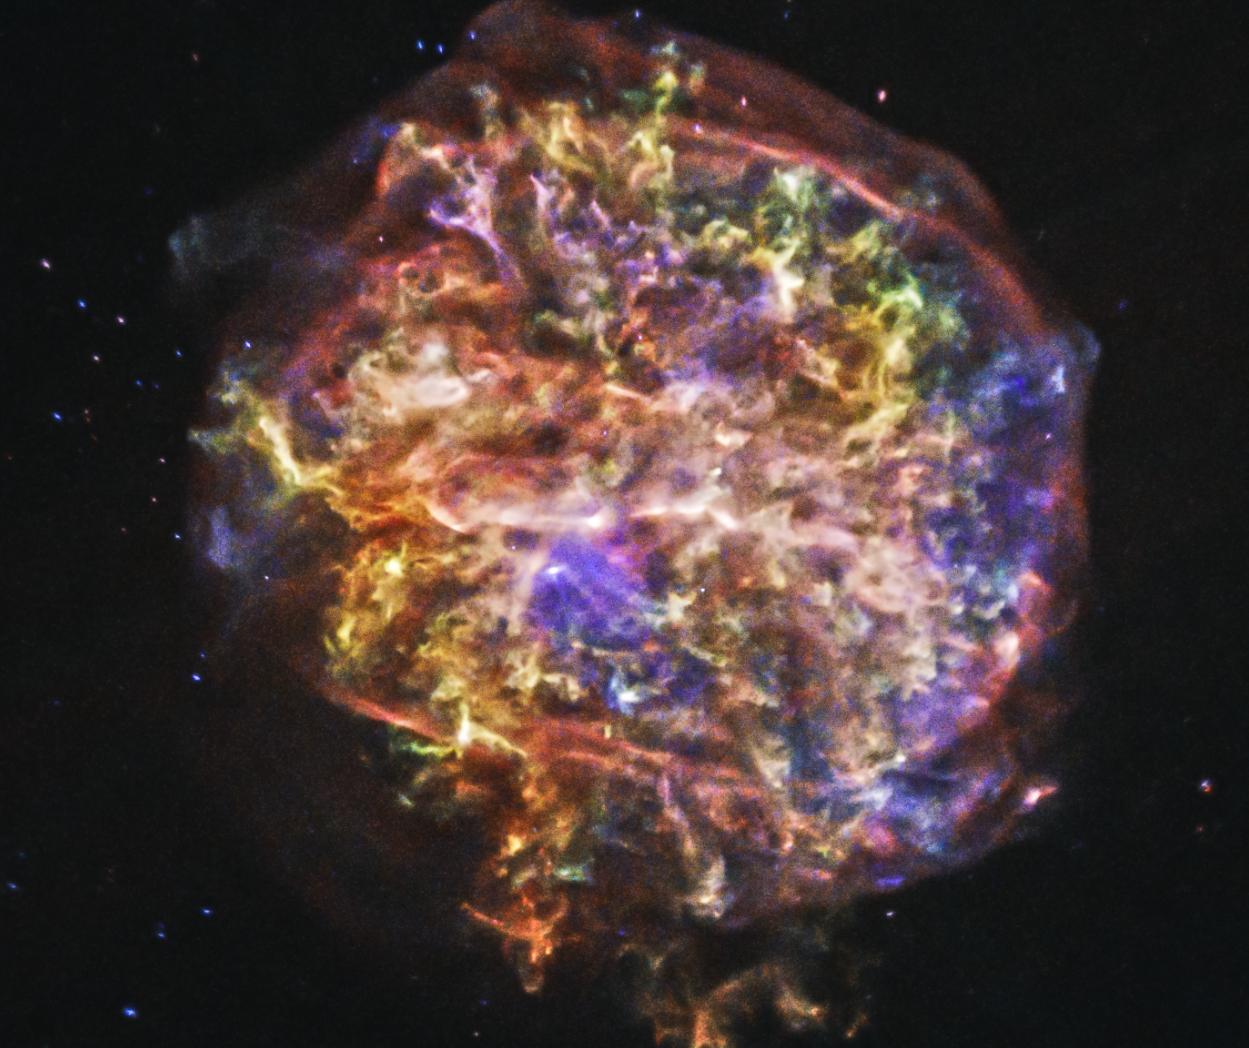 Chandra Celebrates 15th Anniversary: Supernova Remnant ...